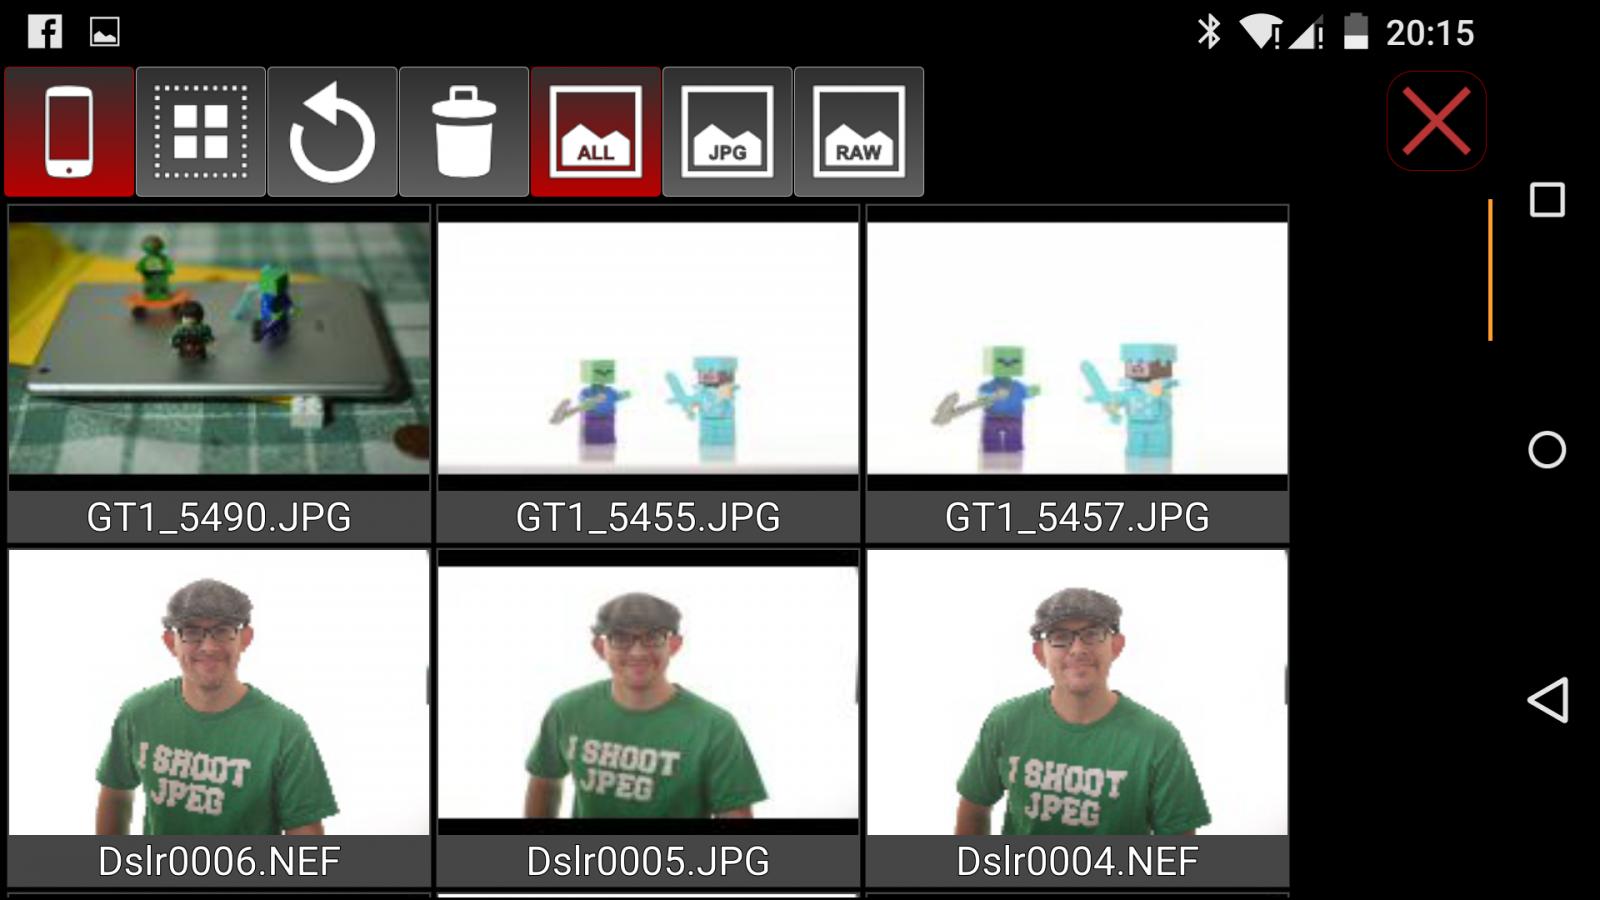 qdslrdashboard-nikon-remote-control-app-android-remote-view